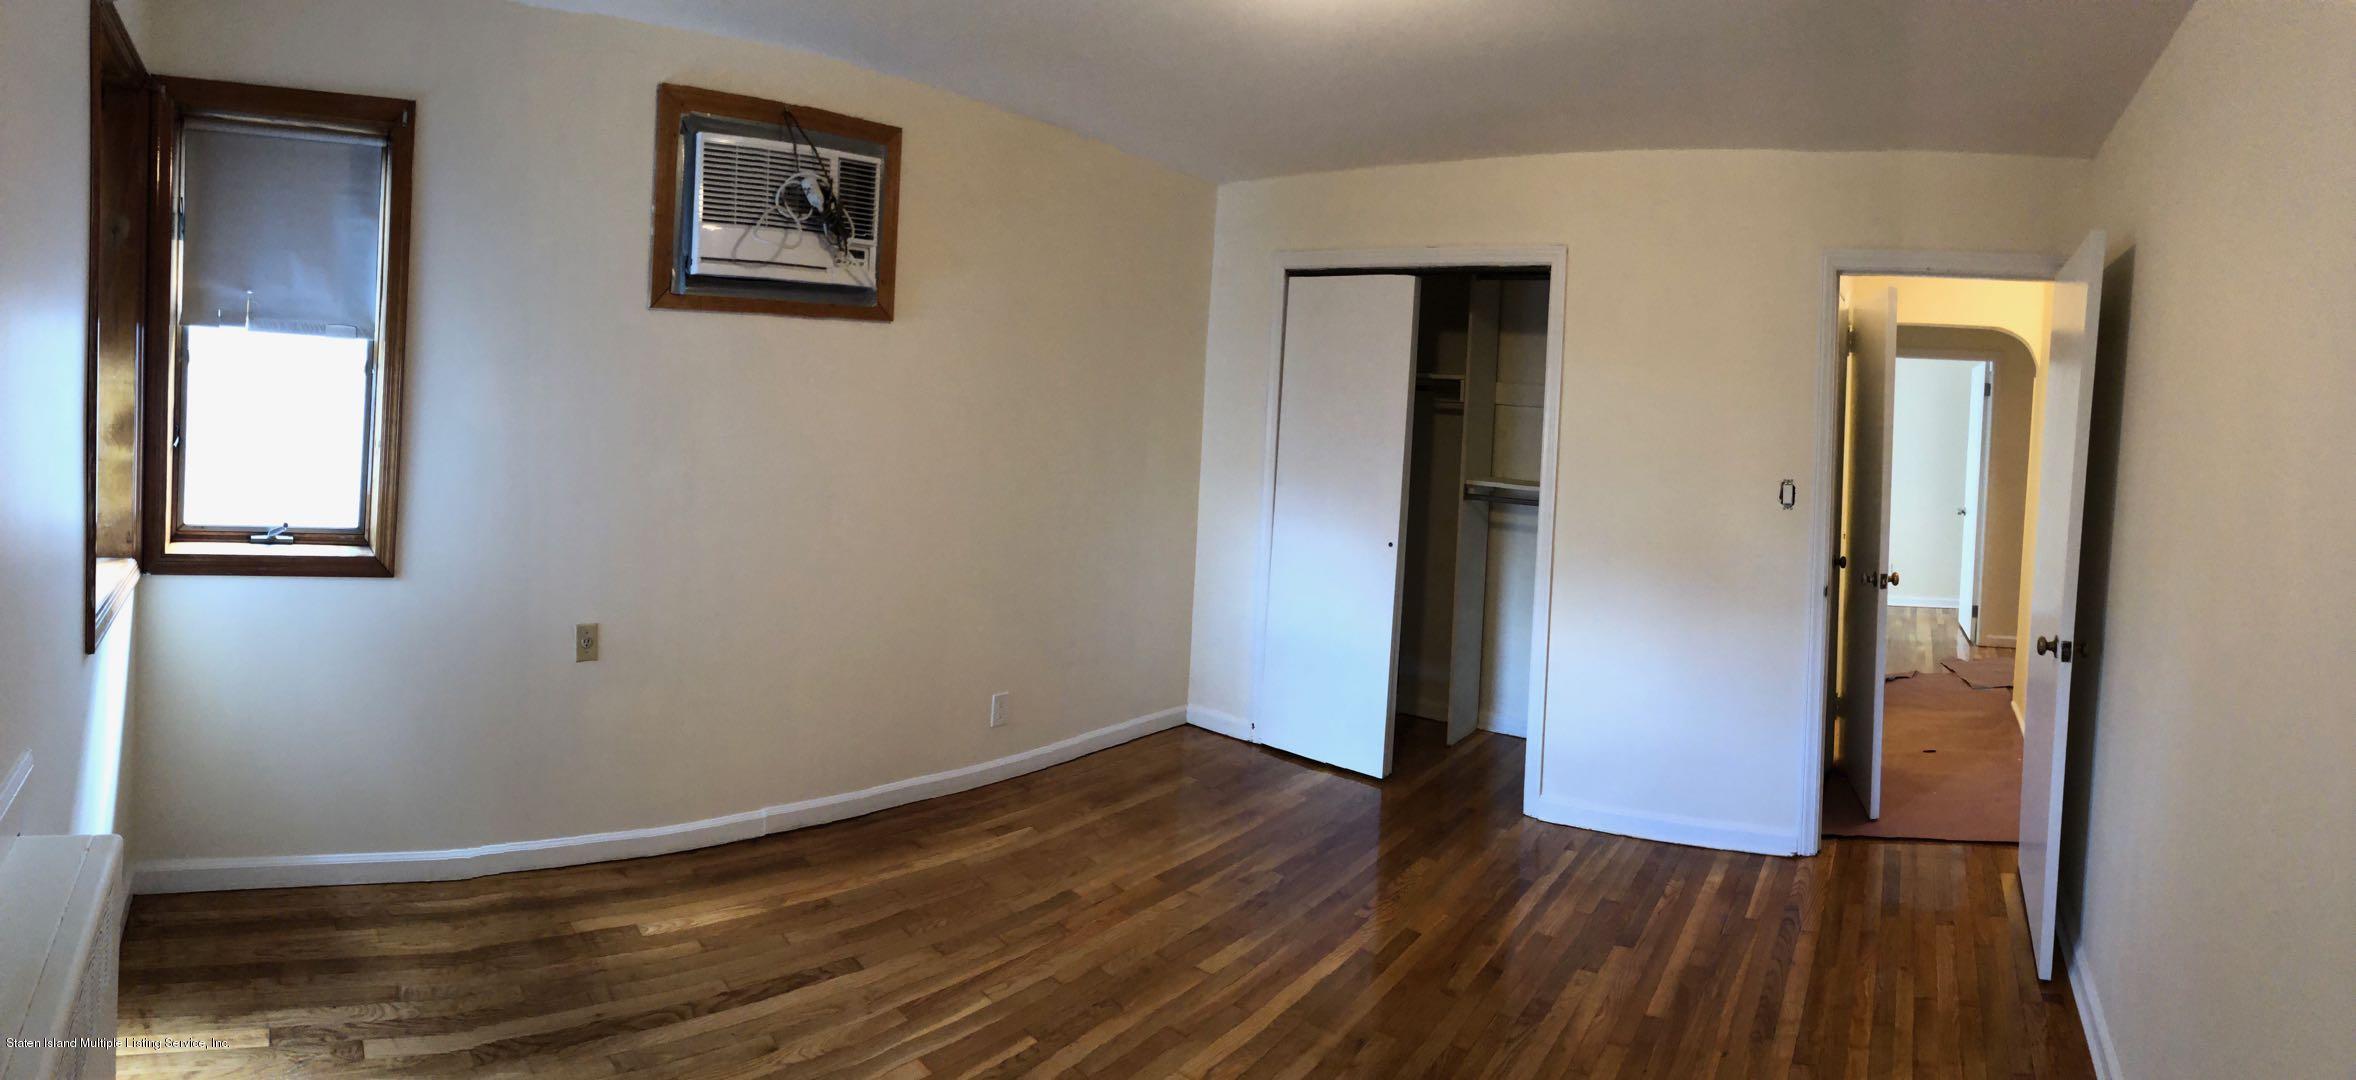 Two Family - Detached 27 Arthur Avenue  Staten Island, NY 10305, MLS-1128566-4